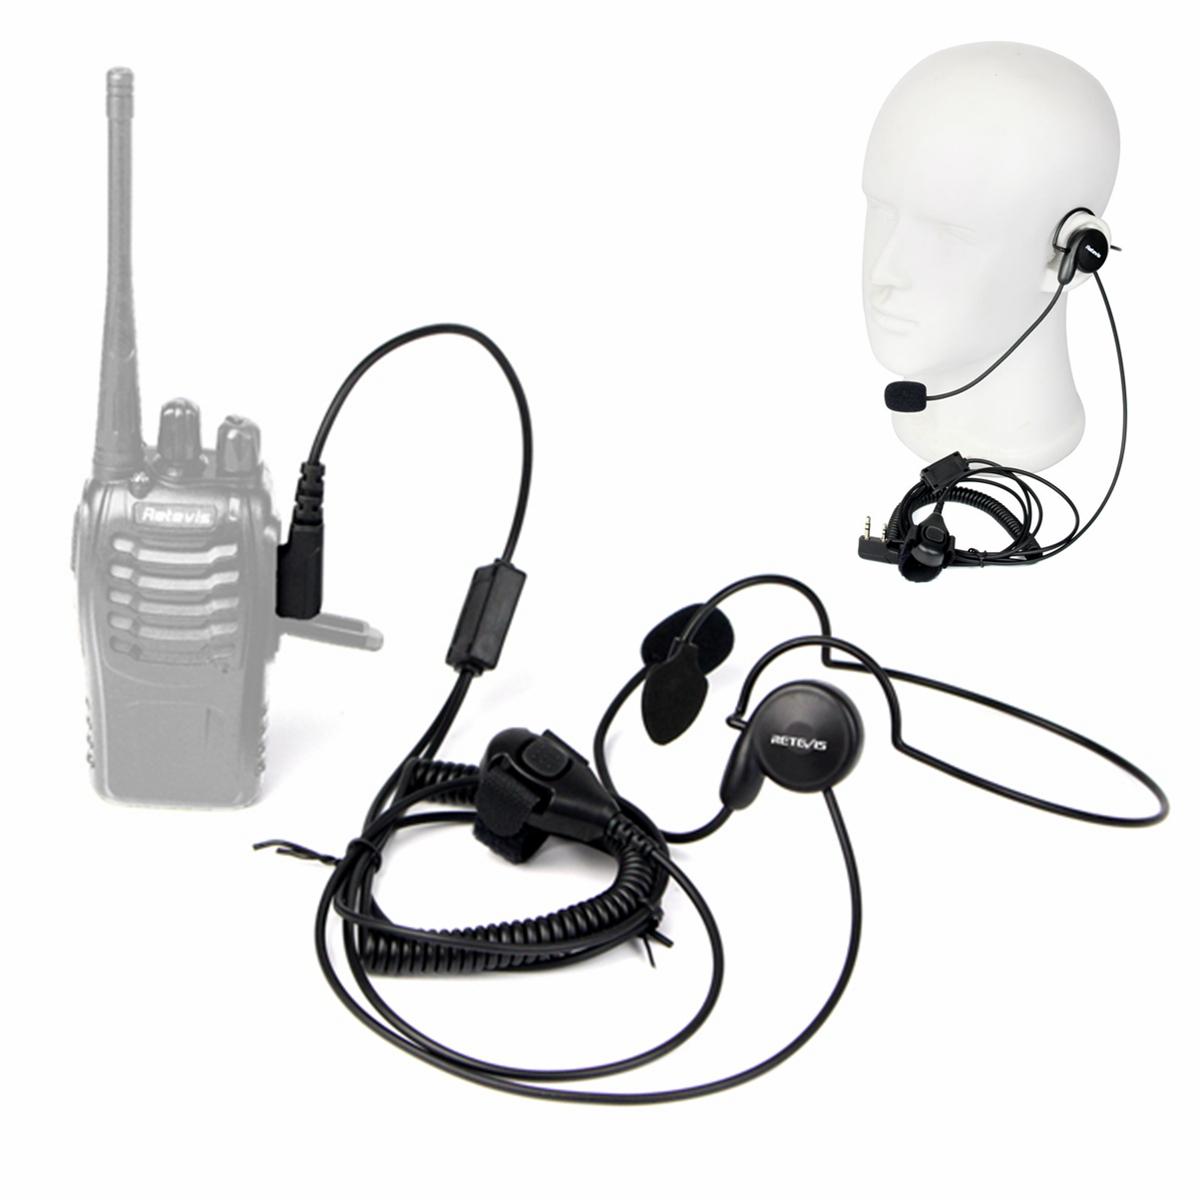 2 Pin PTT Headset Earpiece For Radio Baofeng 888s Retevis H777 Kenwood Hot!!